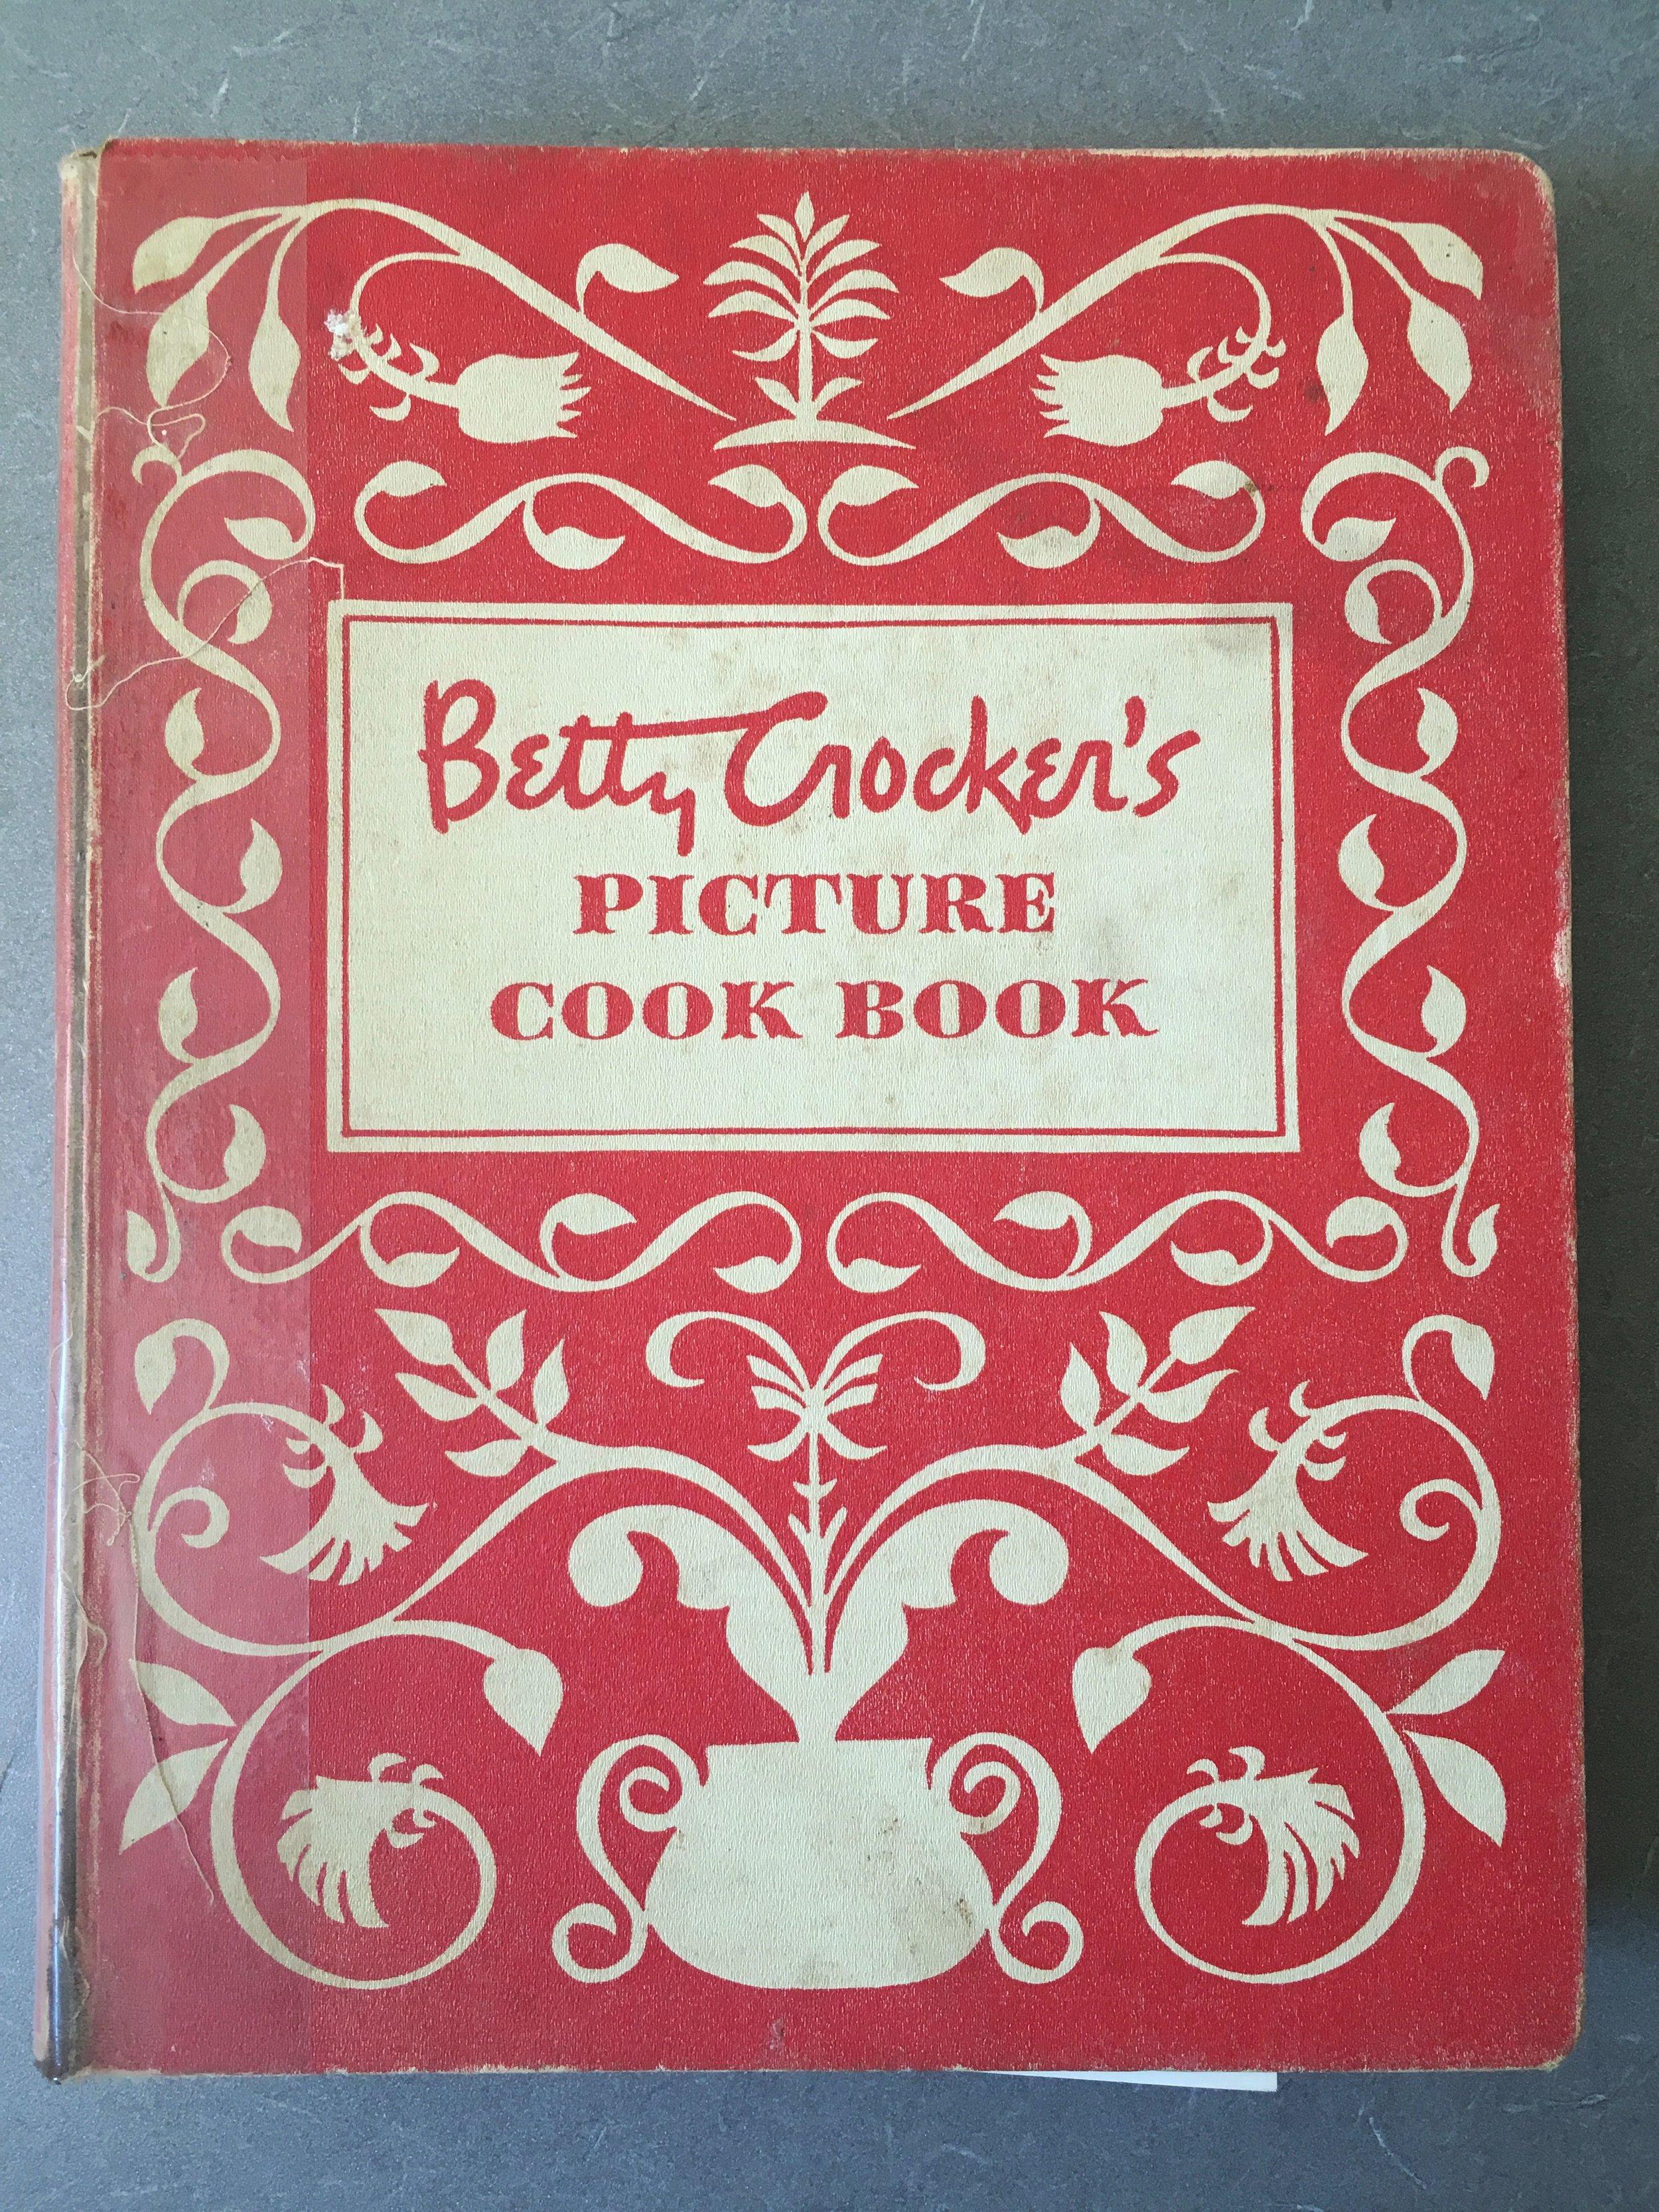 Meatloaf Betty Crocker Picture Book.jpg